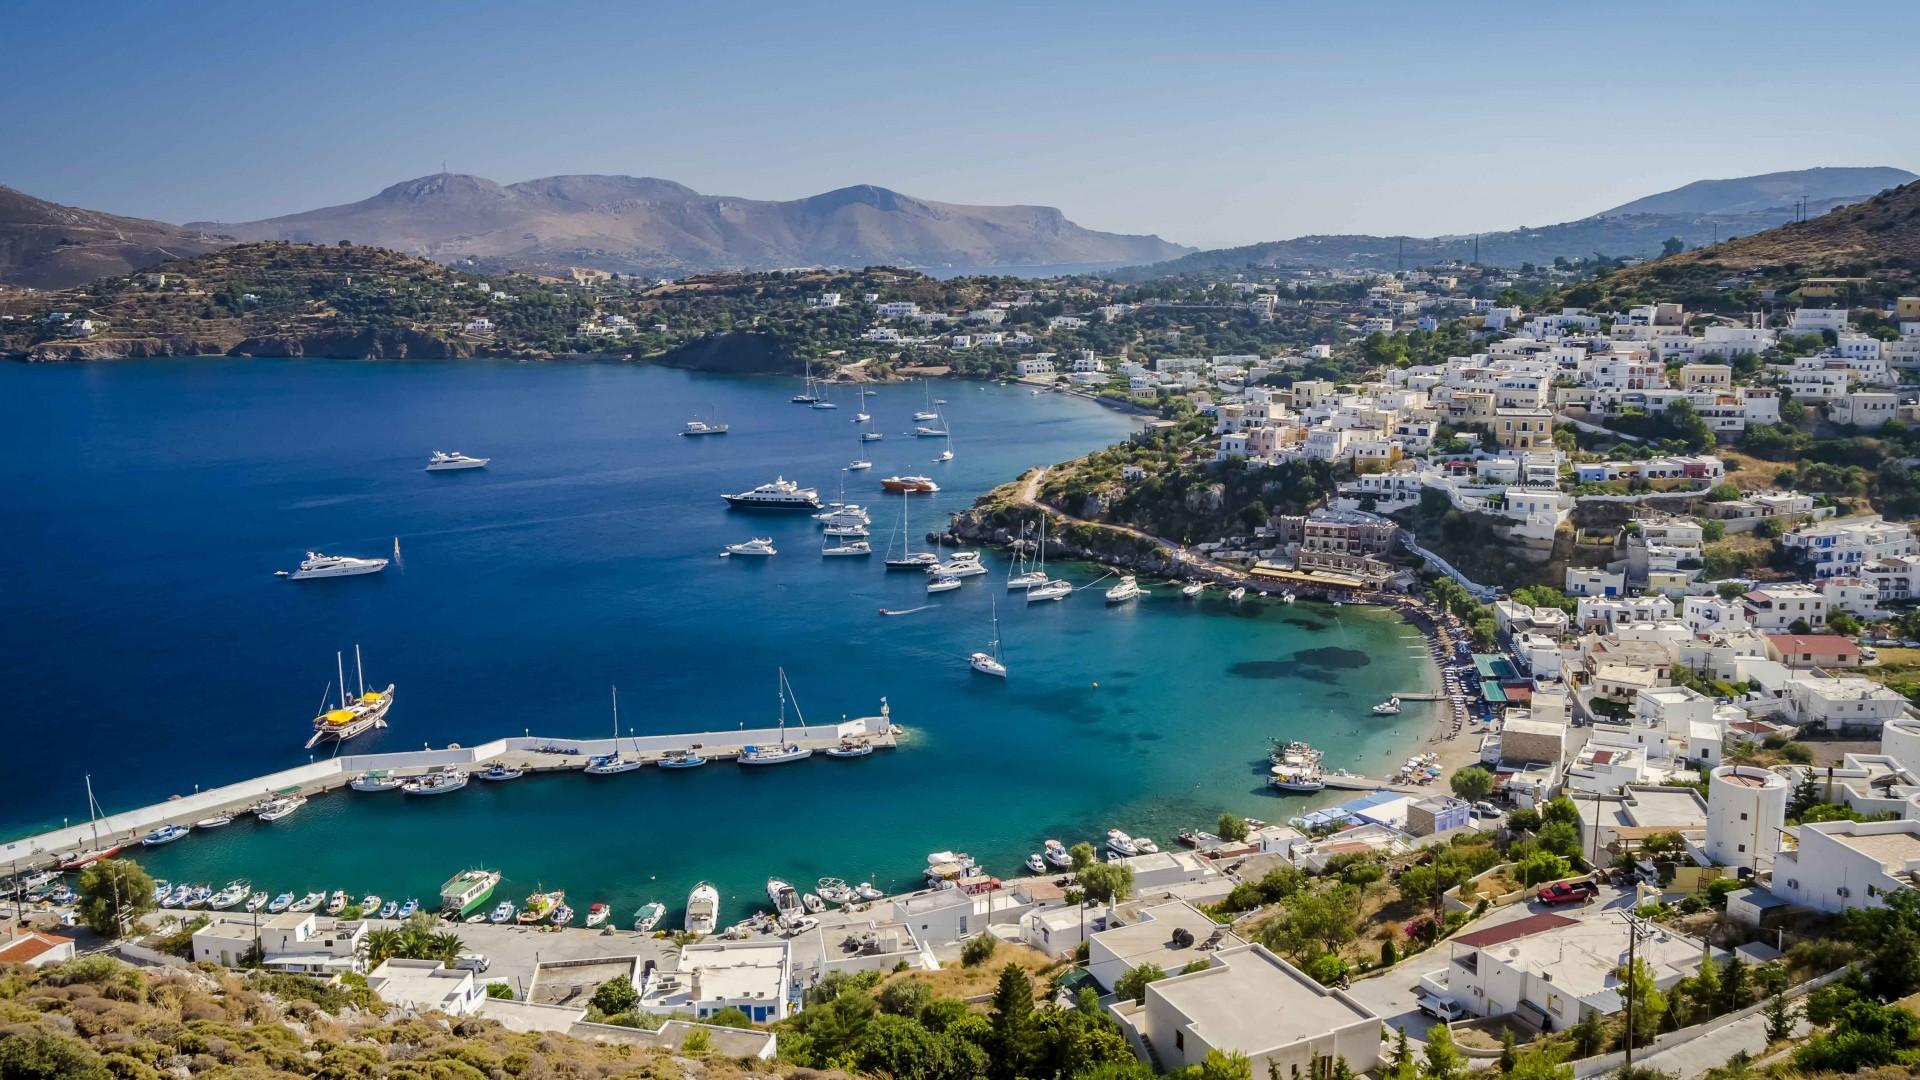 The isle of Leros in Greece